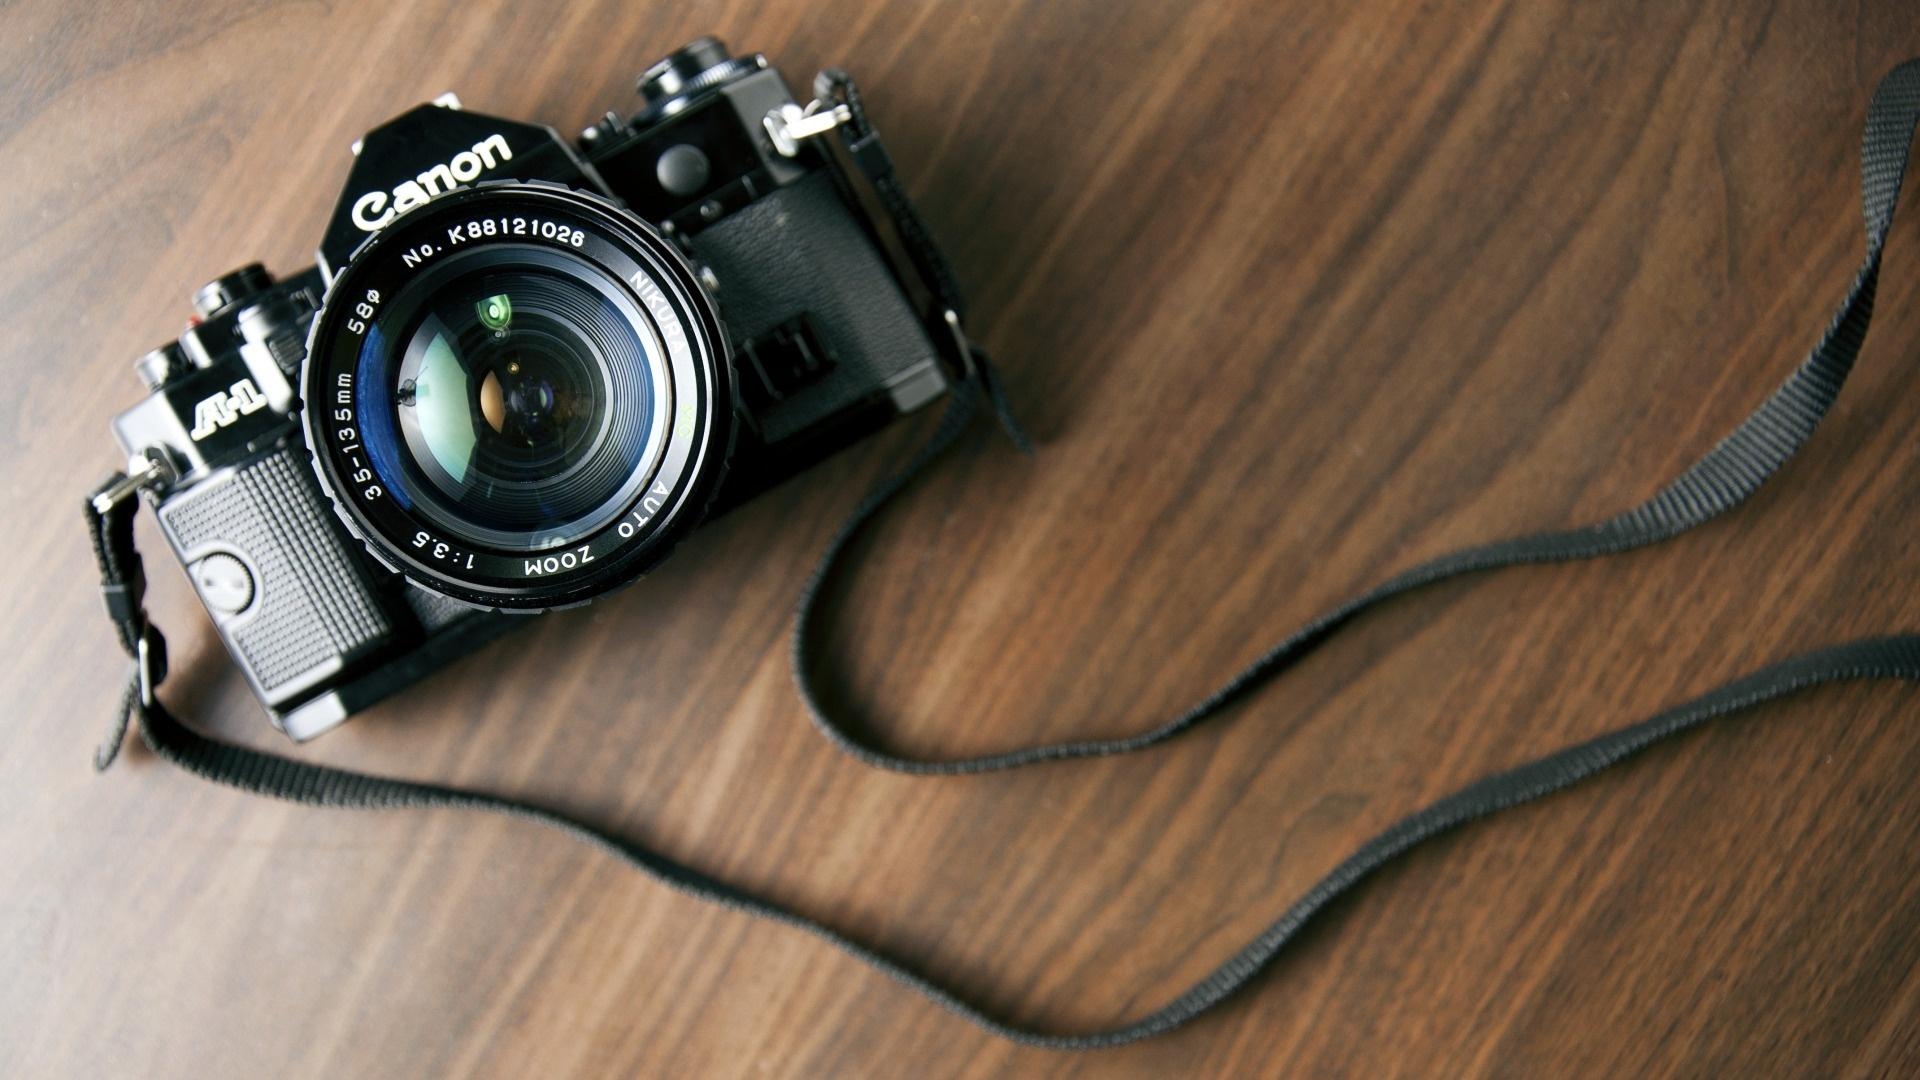 Canon-Camera-Photography-HD-Desktop-Wallpaper.jpg